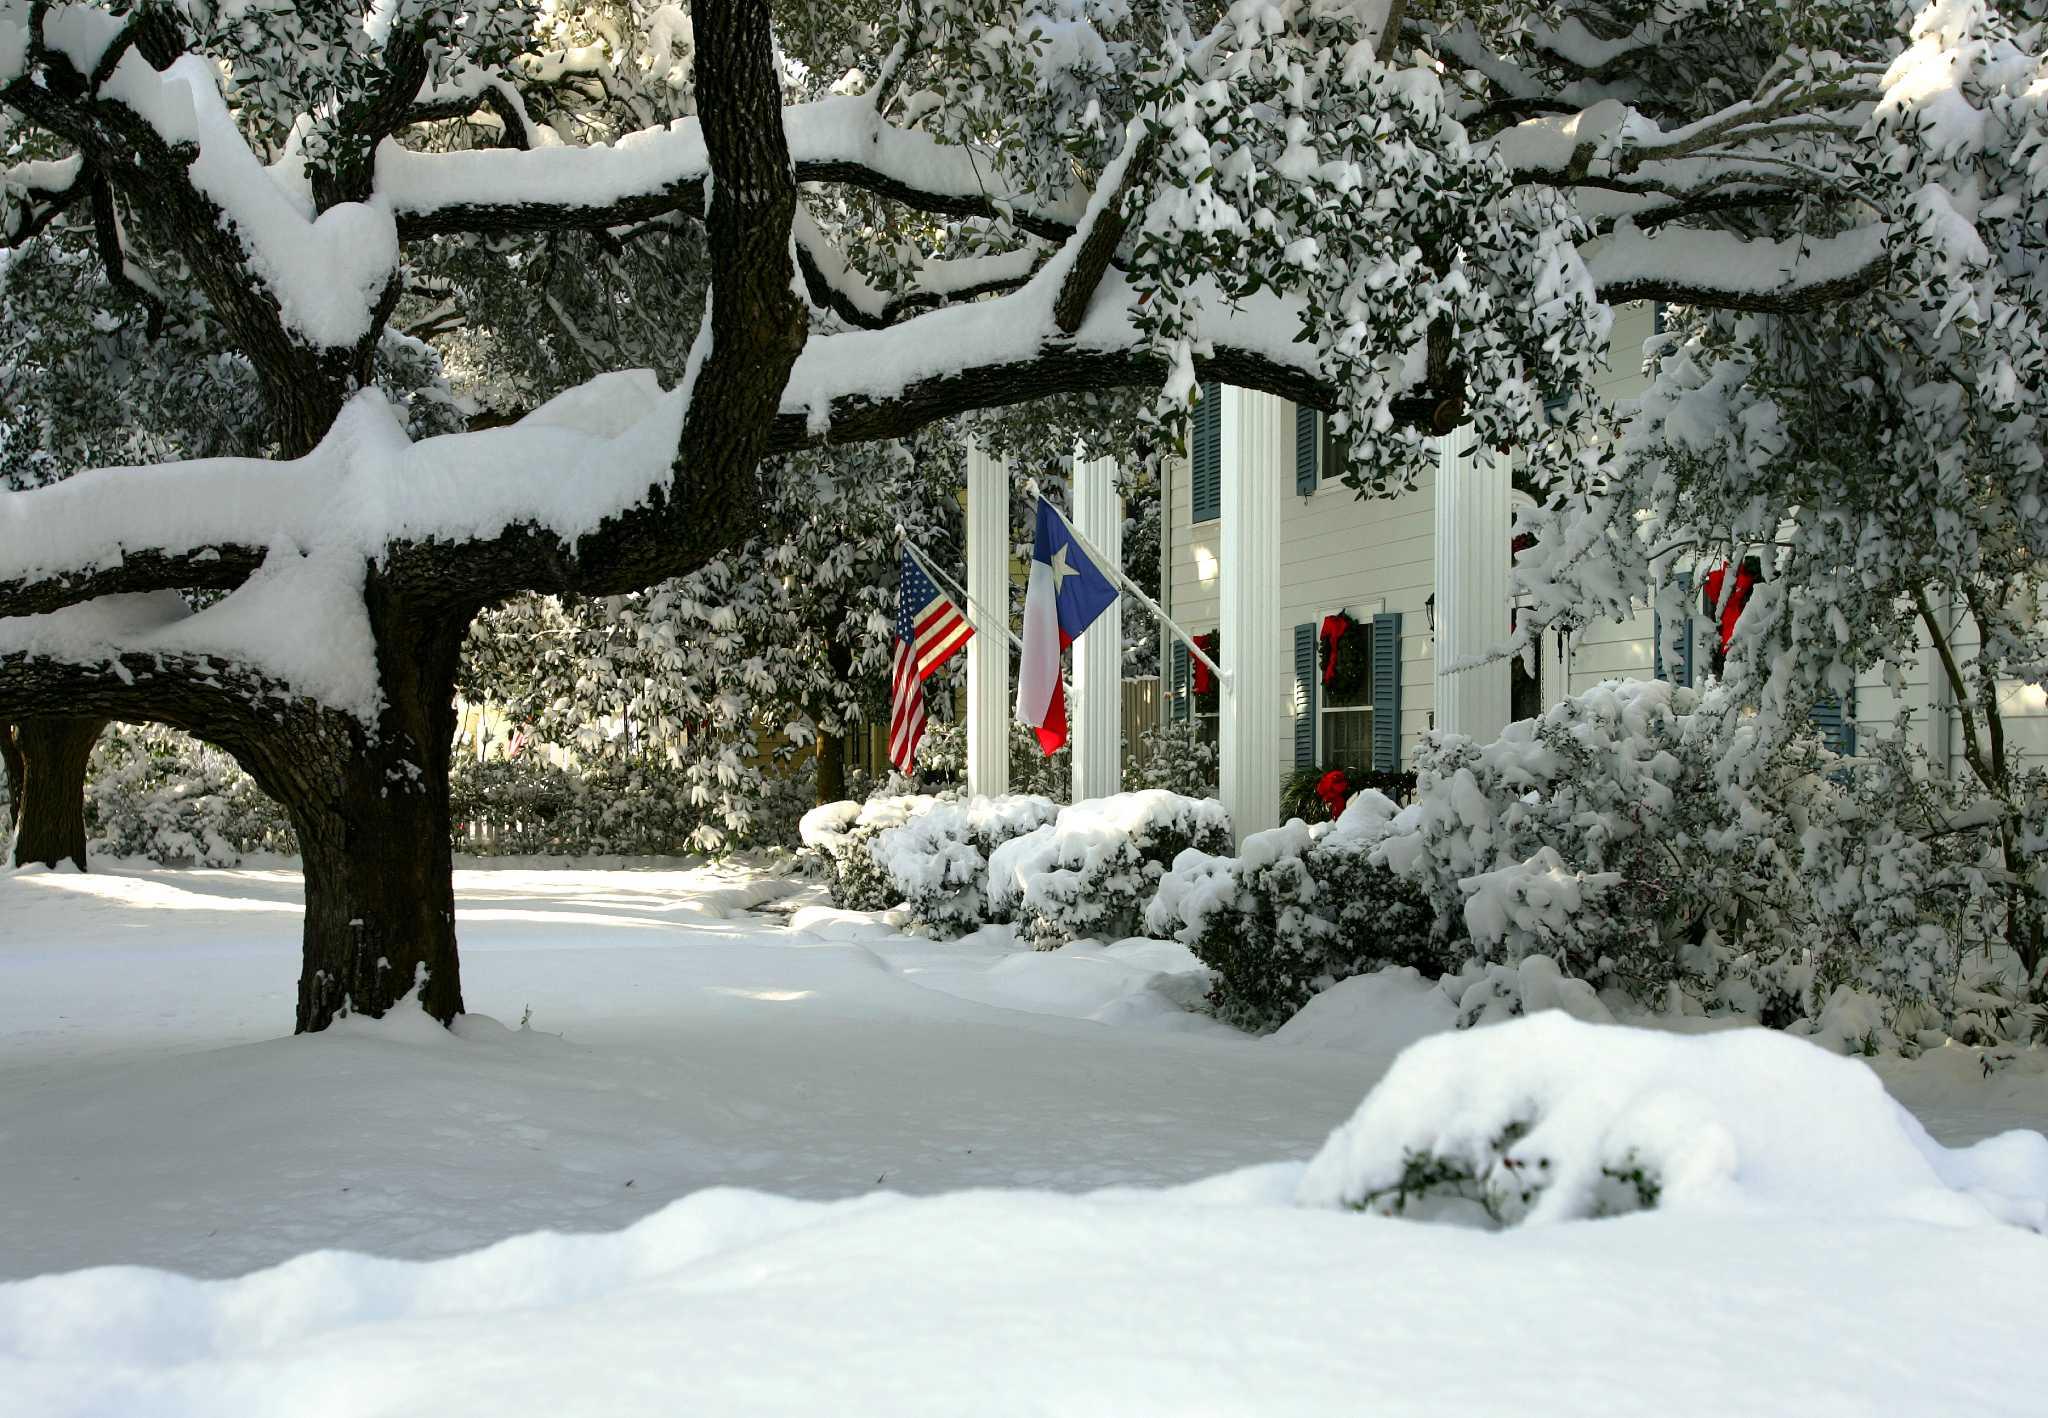 Christmas Snow Of 2004 Still Stirs Memories Expressnews Com